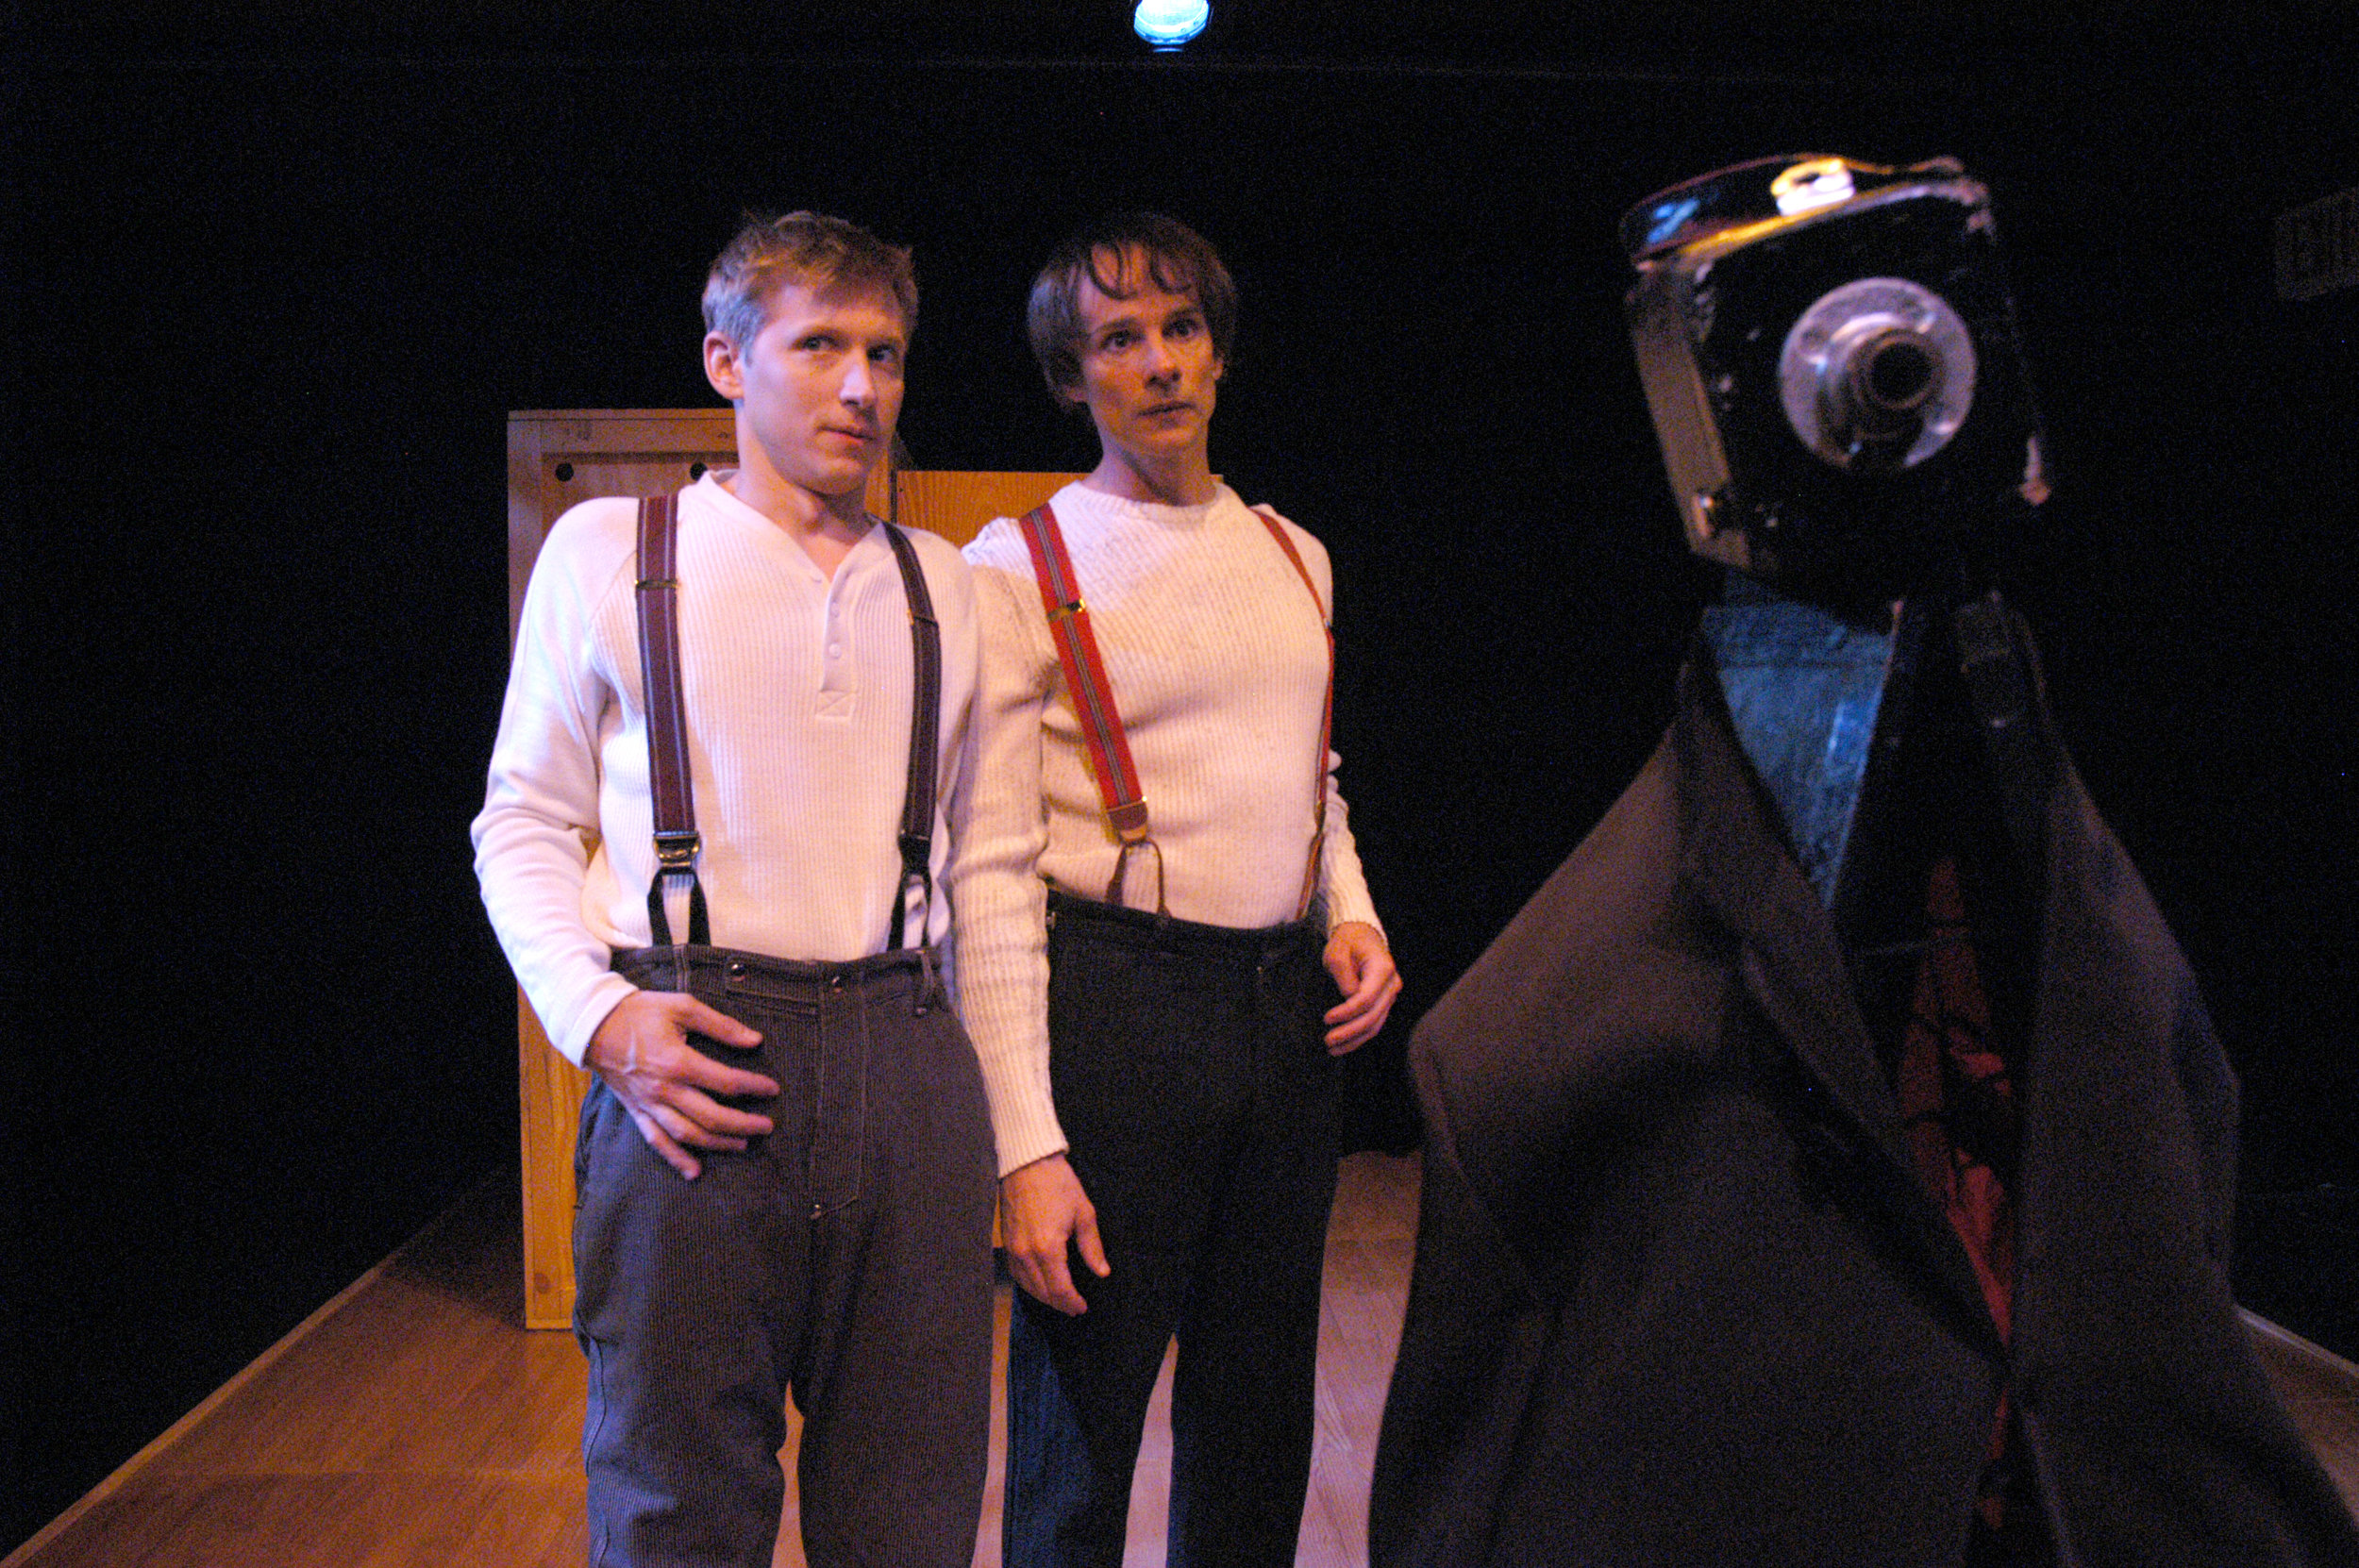 Quinnopolis vs. Hamlet